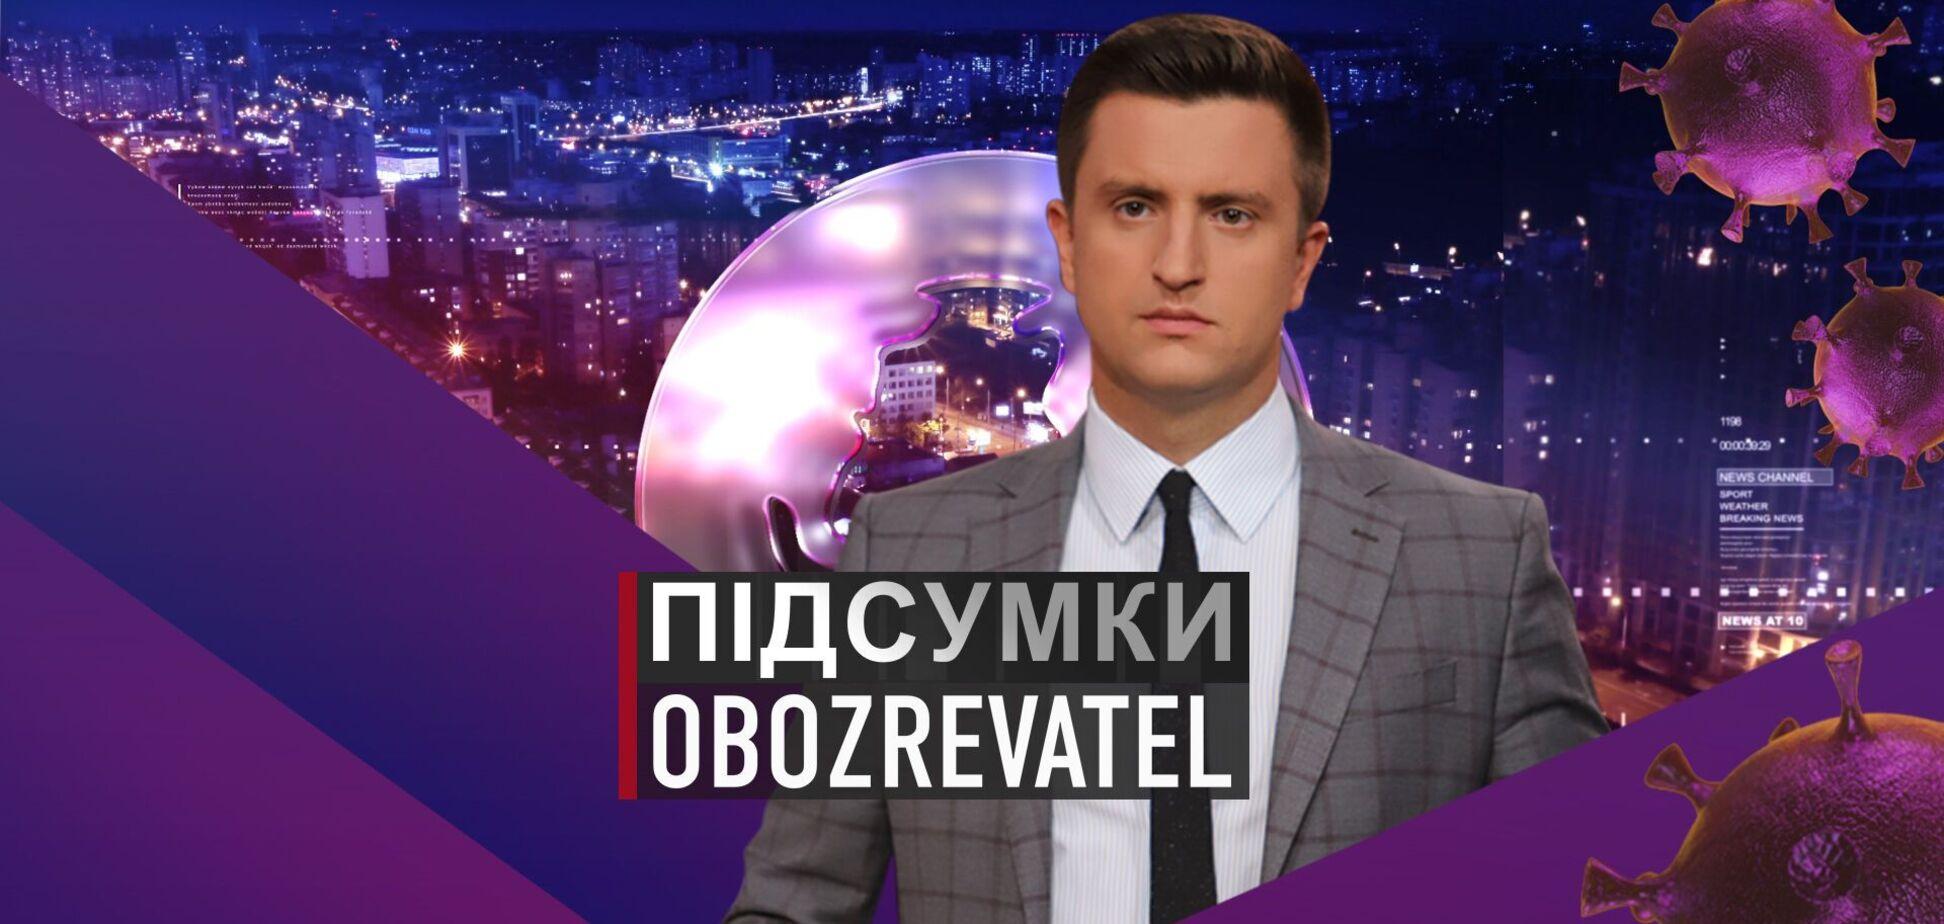 Підсумки с Вадимом Колодийчуком. Пятница, 9 июля